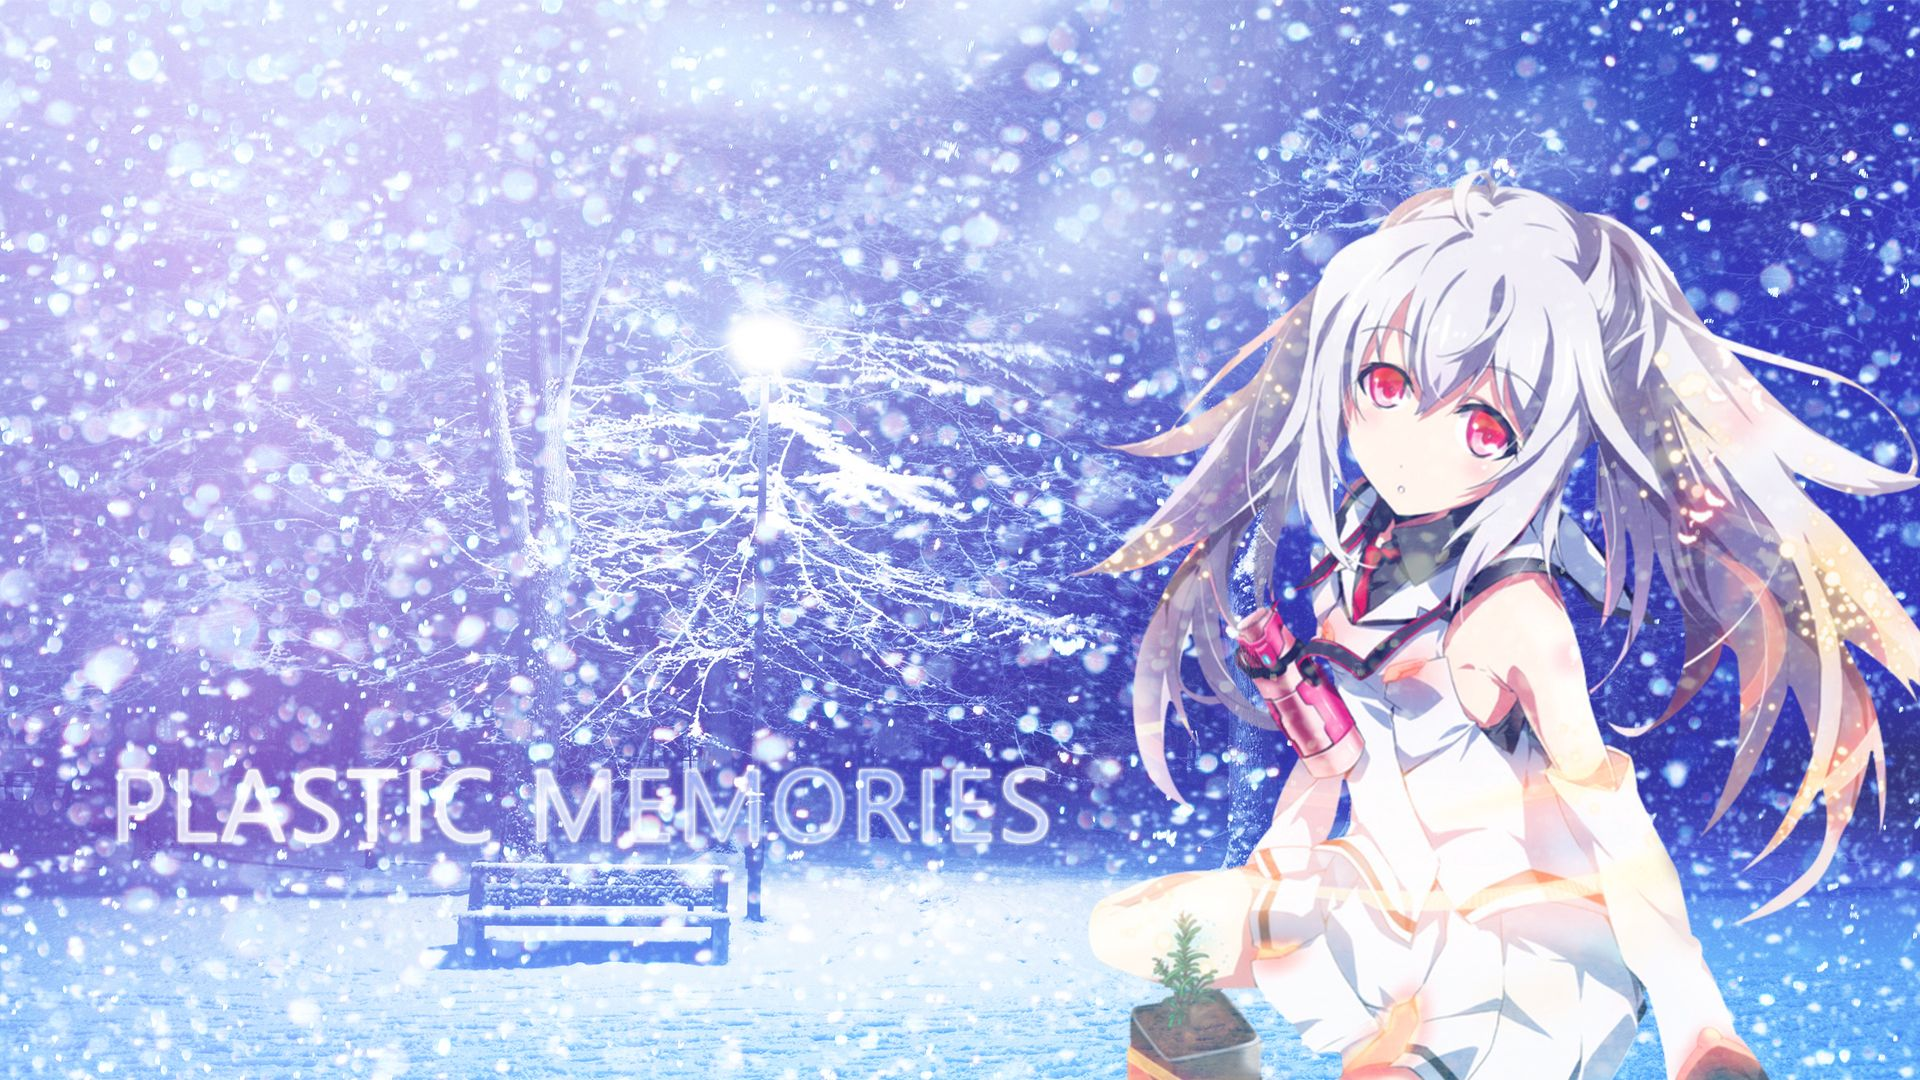 Plastic Memories Computer Wallpapers Desktop Backgrounds 1920x1080 Id 657811 Plastic Memories Memories Anime Anime Mermaid